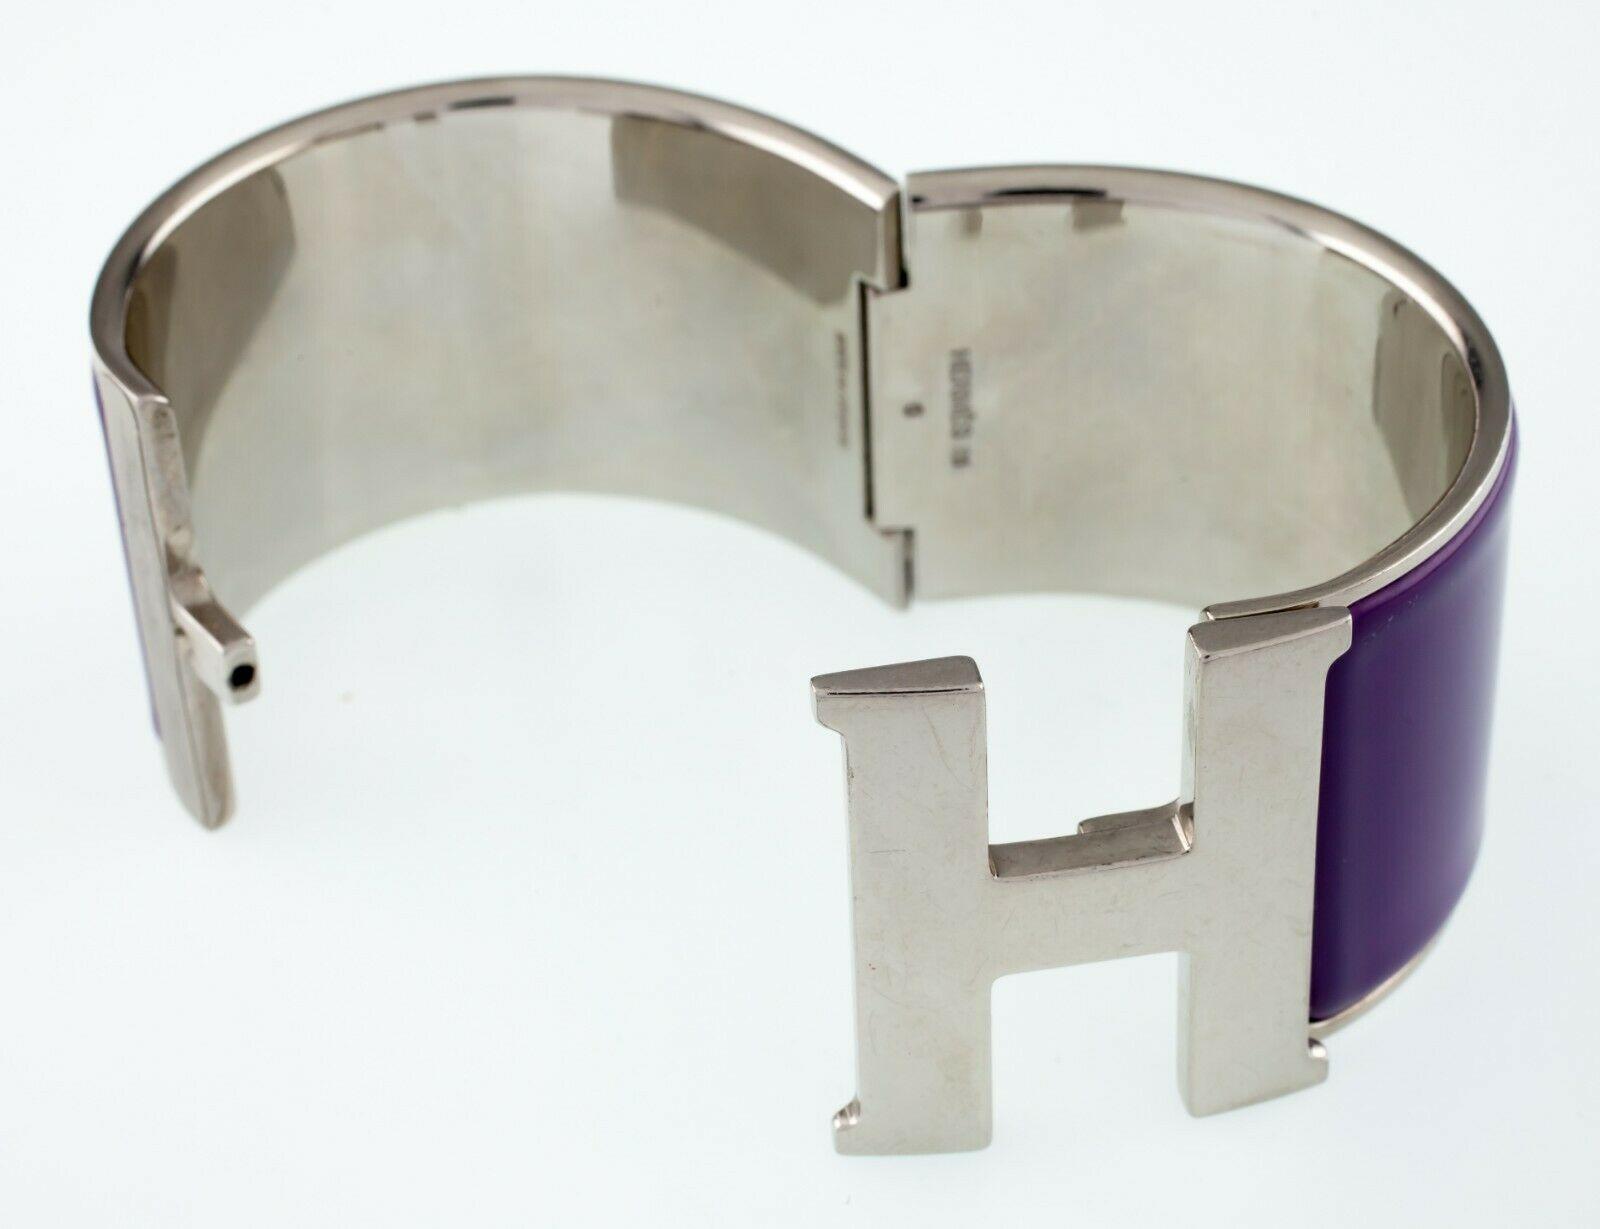 Hermès Clic Clac Violeta Extra Ancho Pulsera Nice! image 5